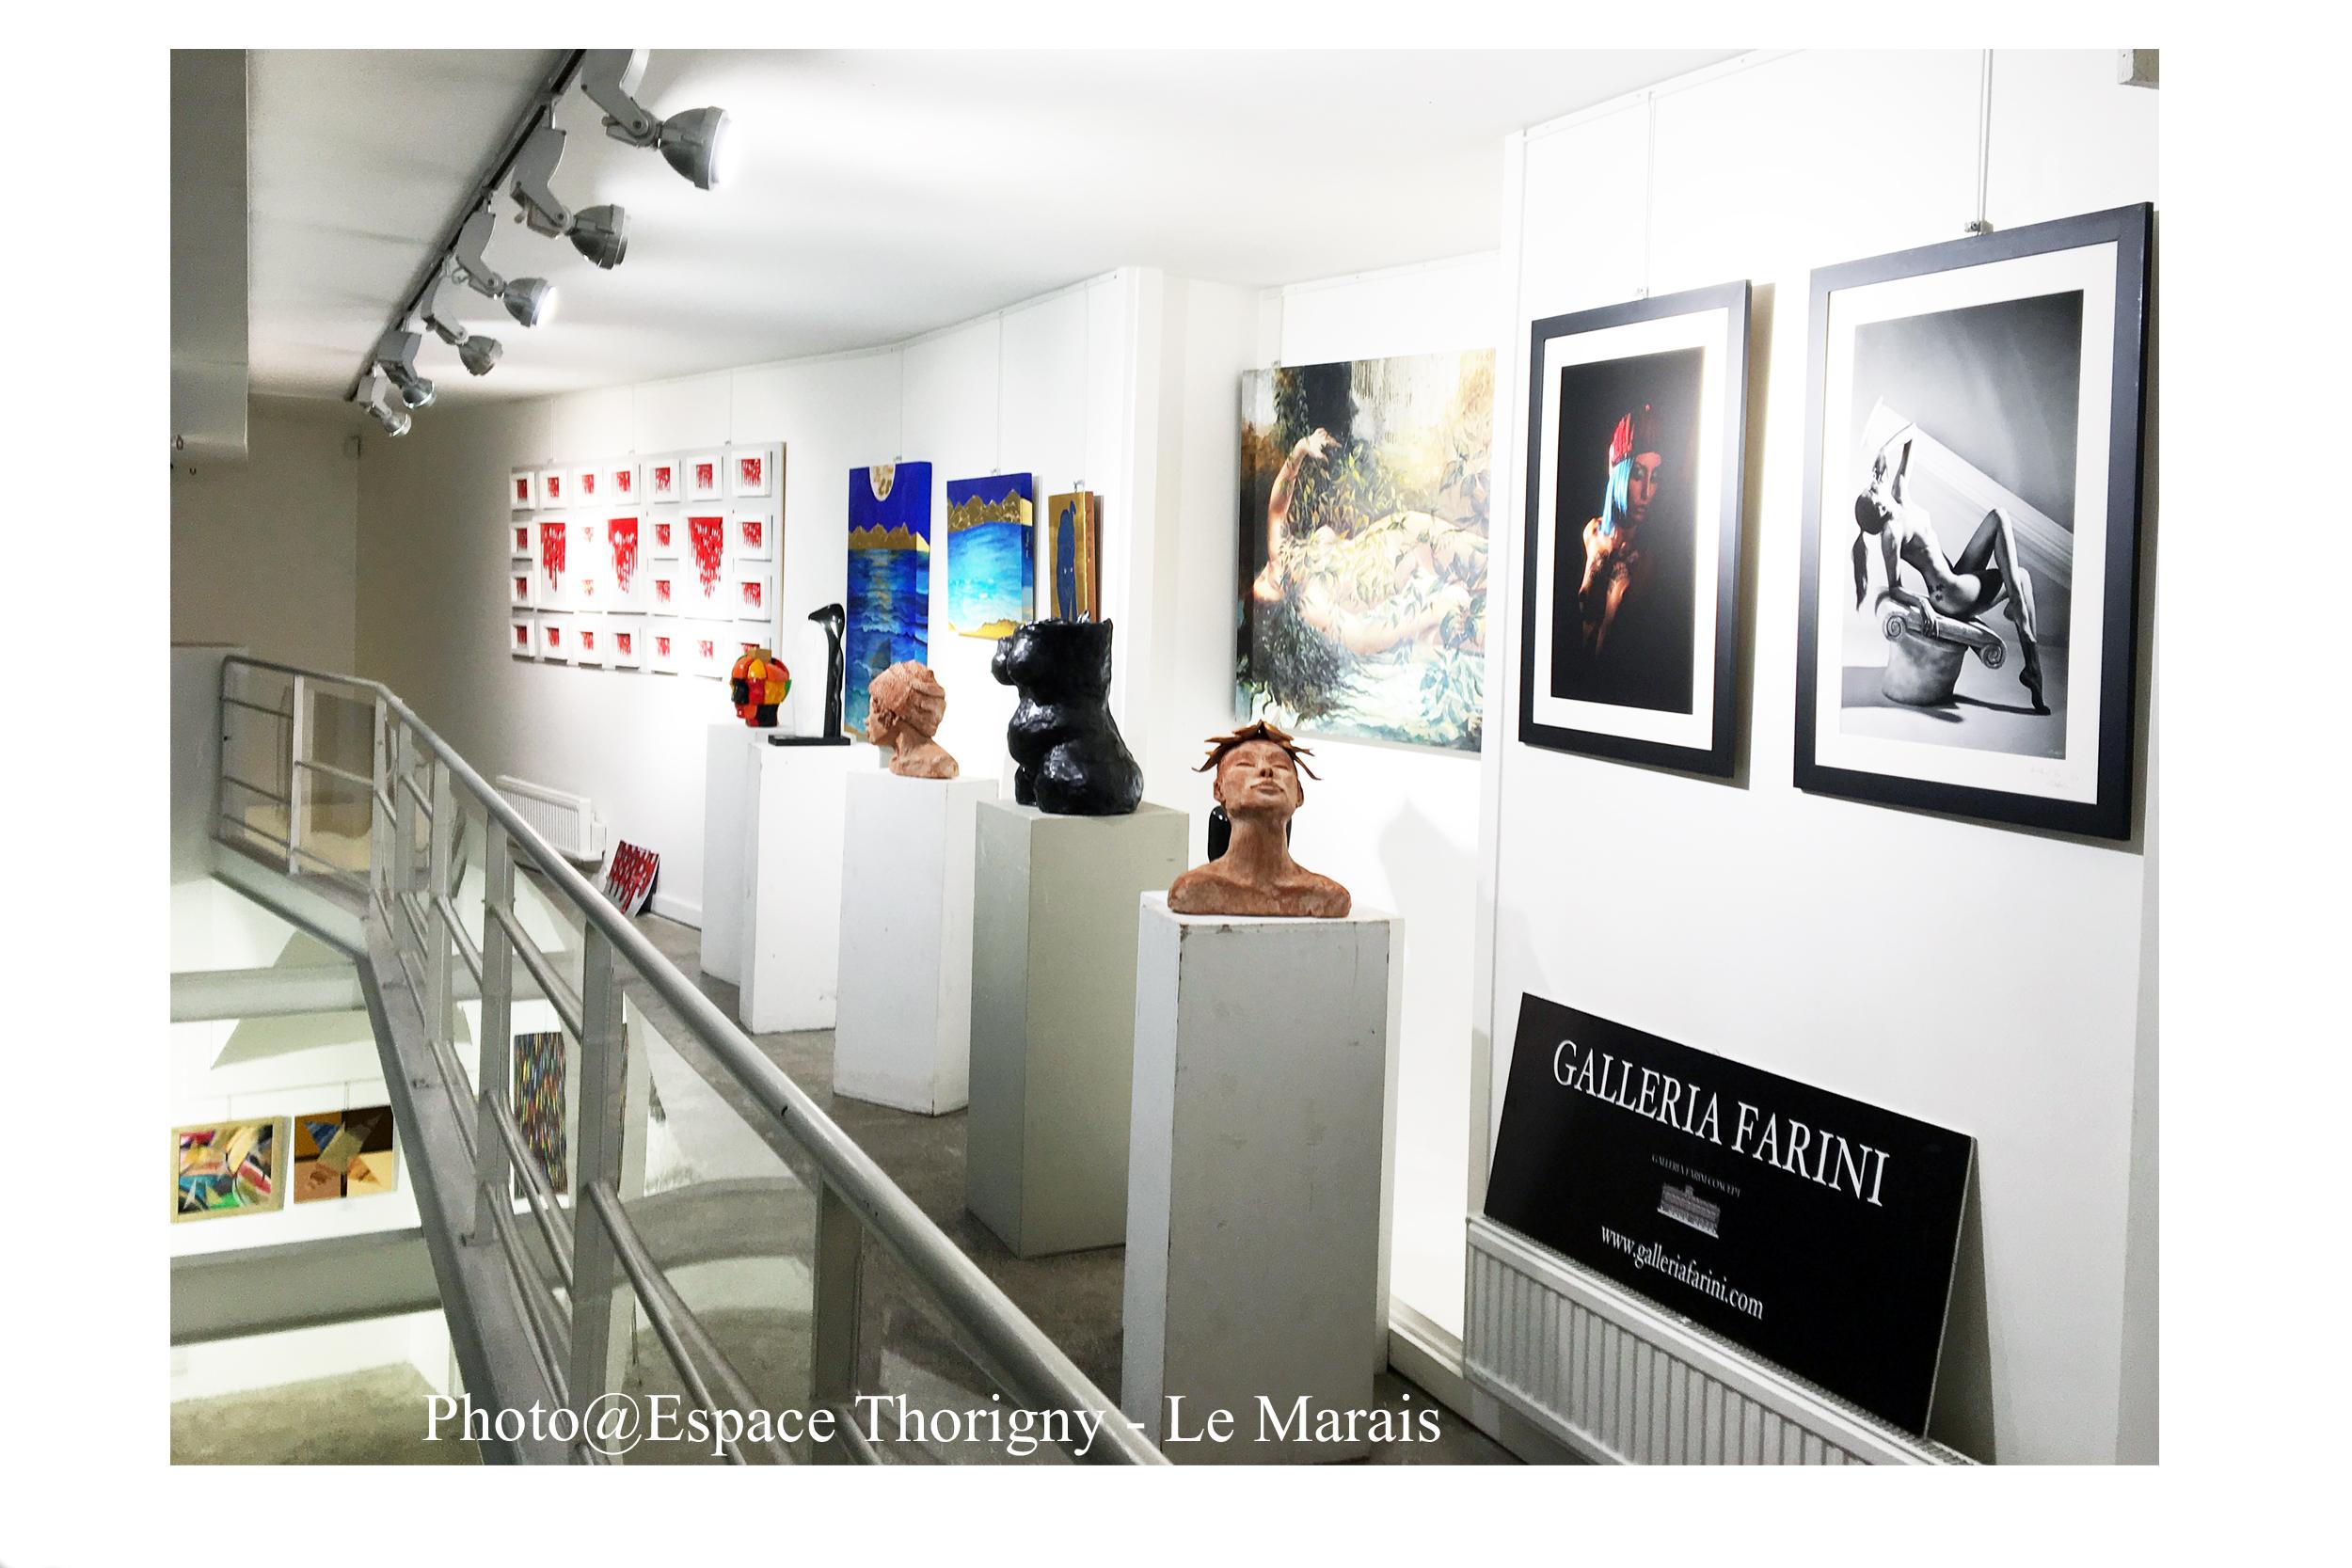 Galleria Farini 0.jpg